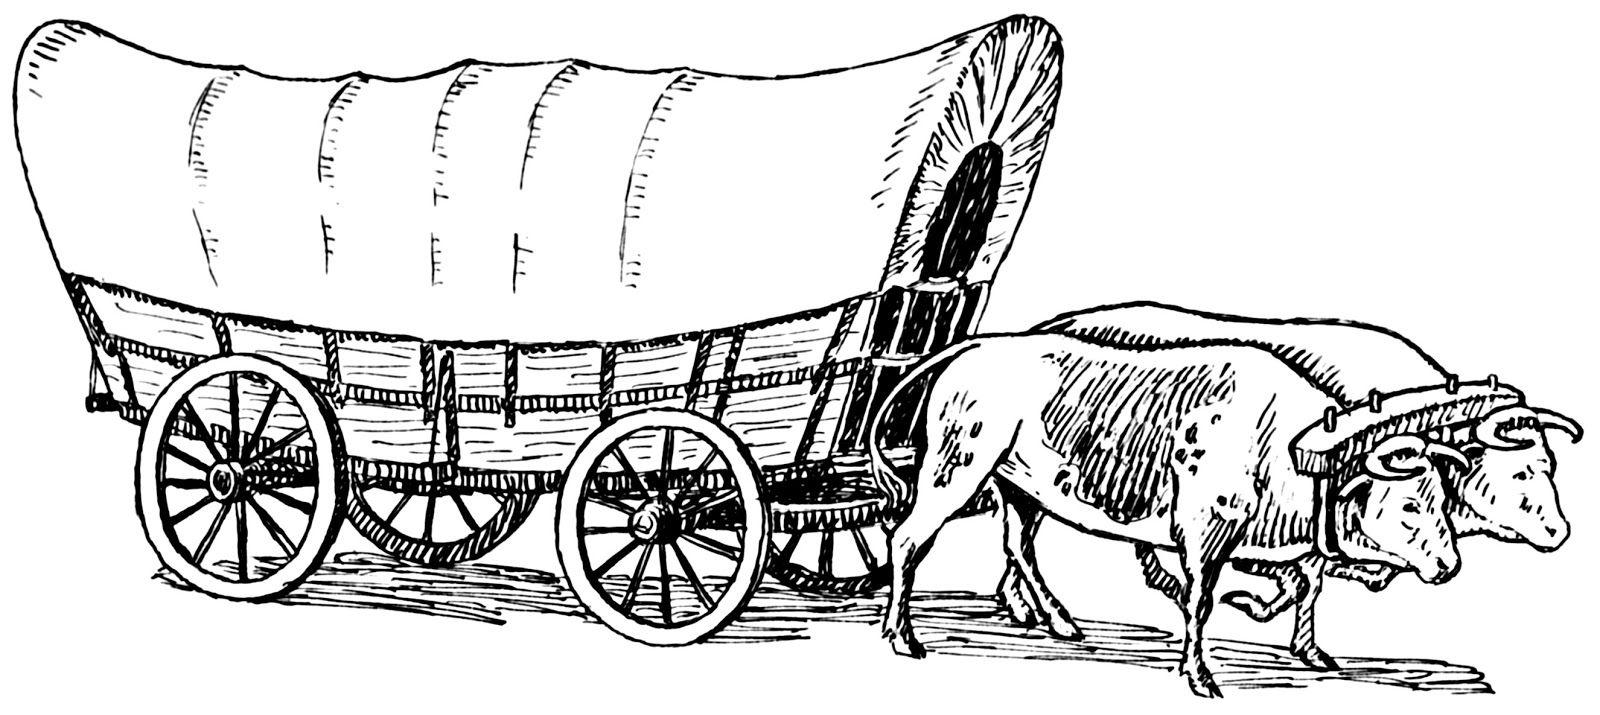 Two oxen conastoga west. Wagon clipart sketch